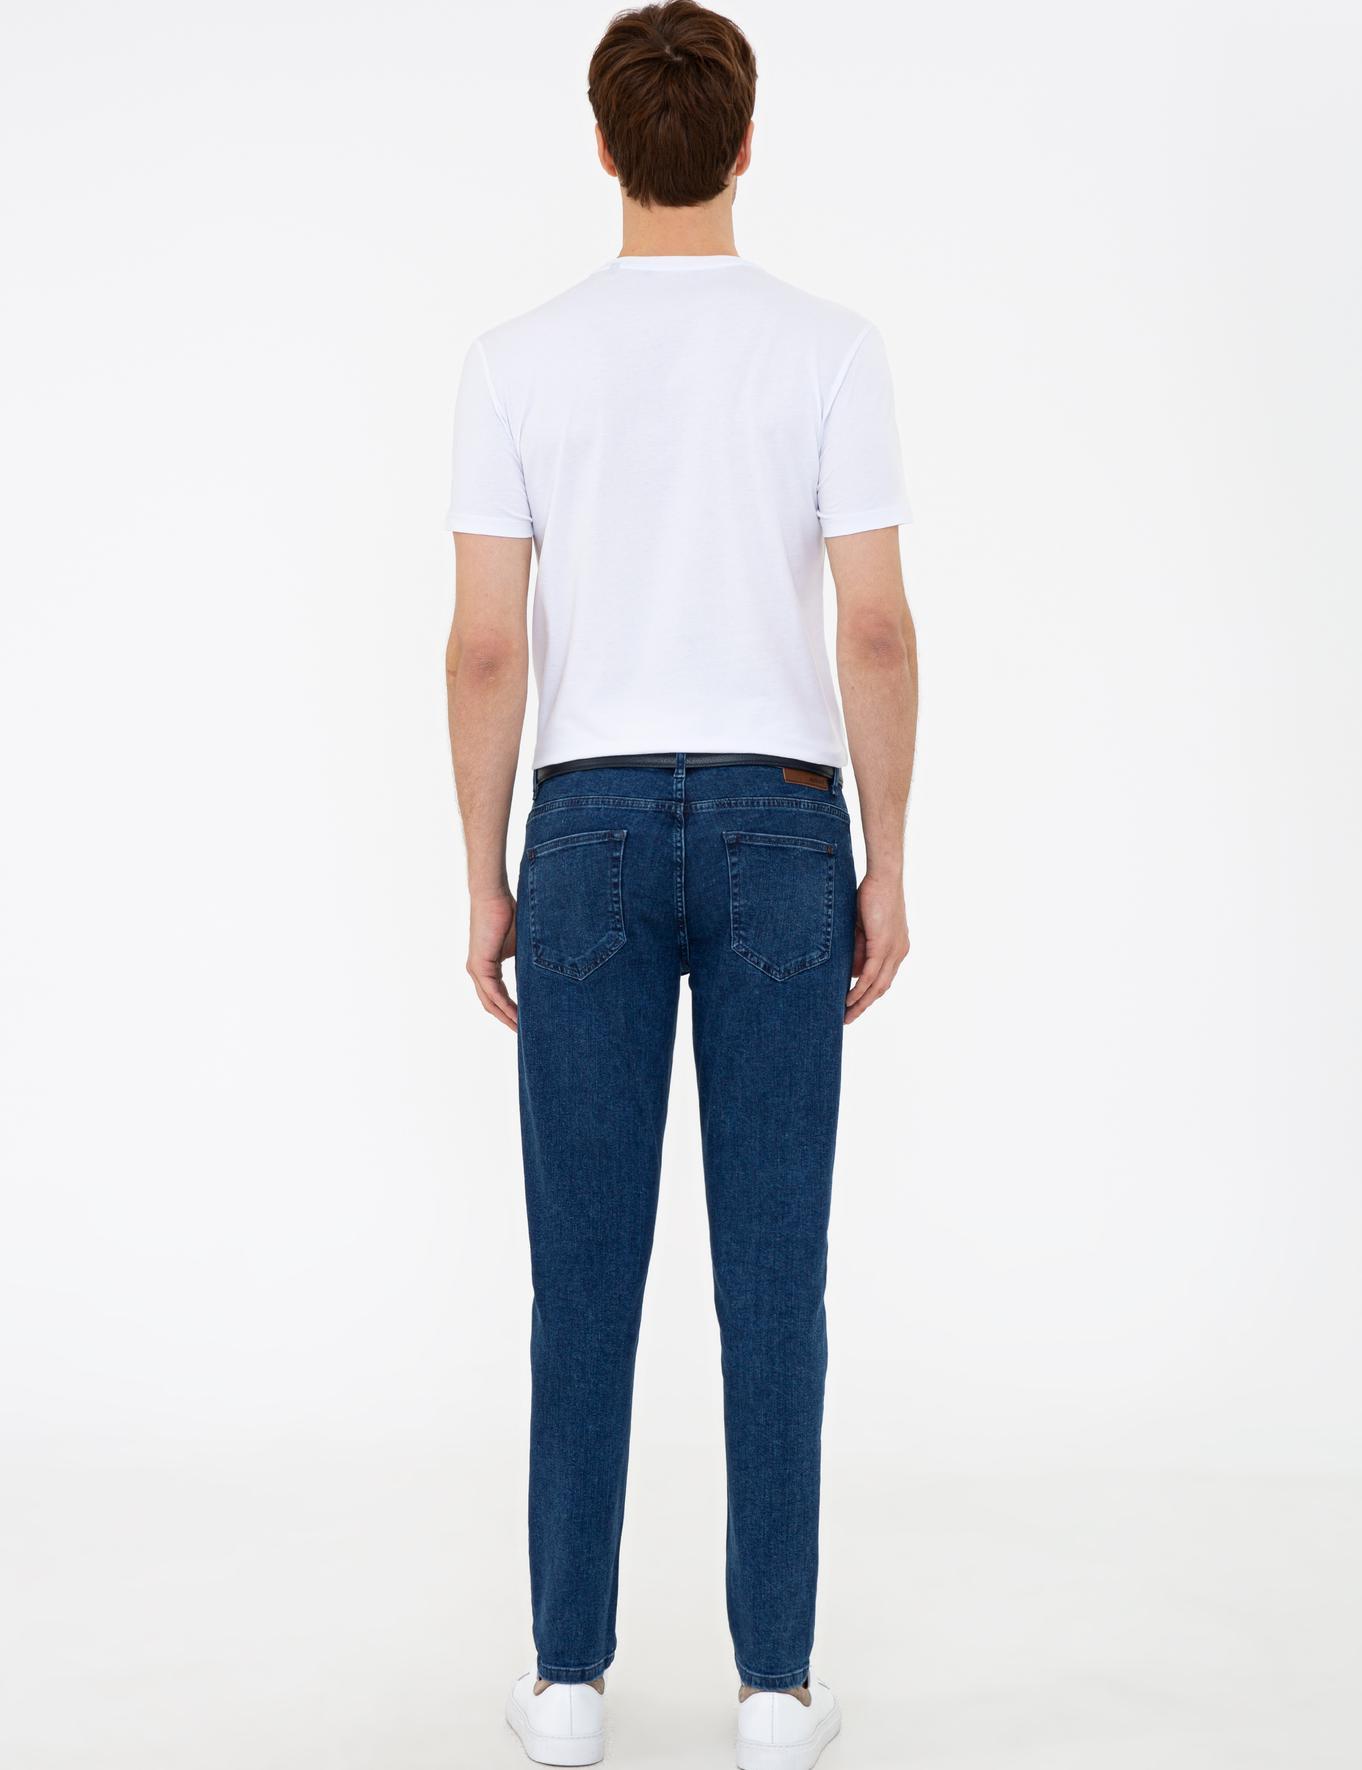 Açık Mavi Slim Fit Denim - 50240008032